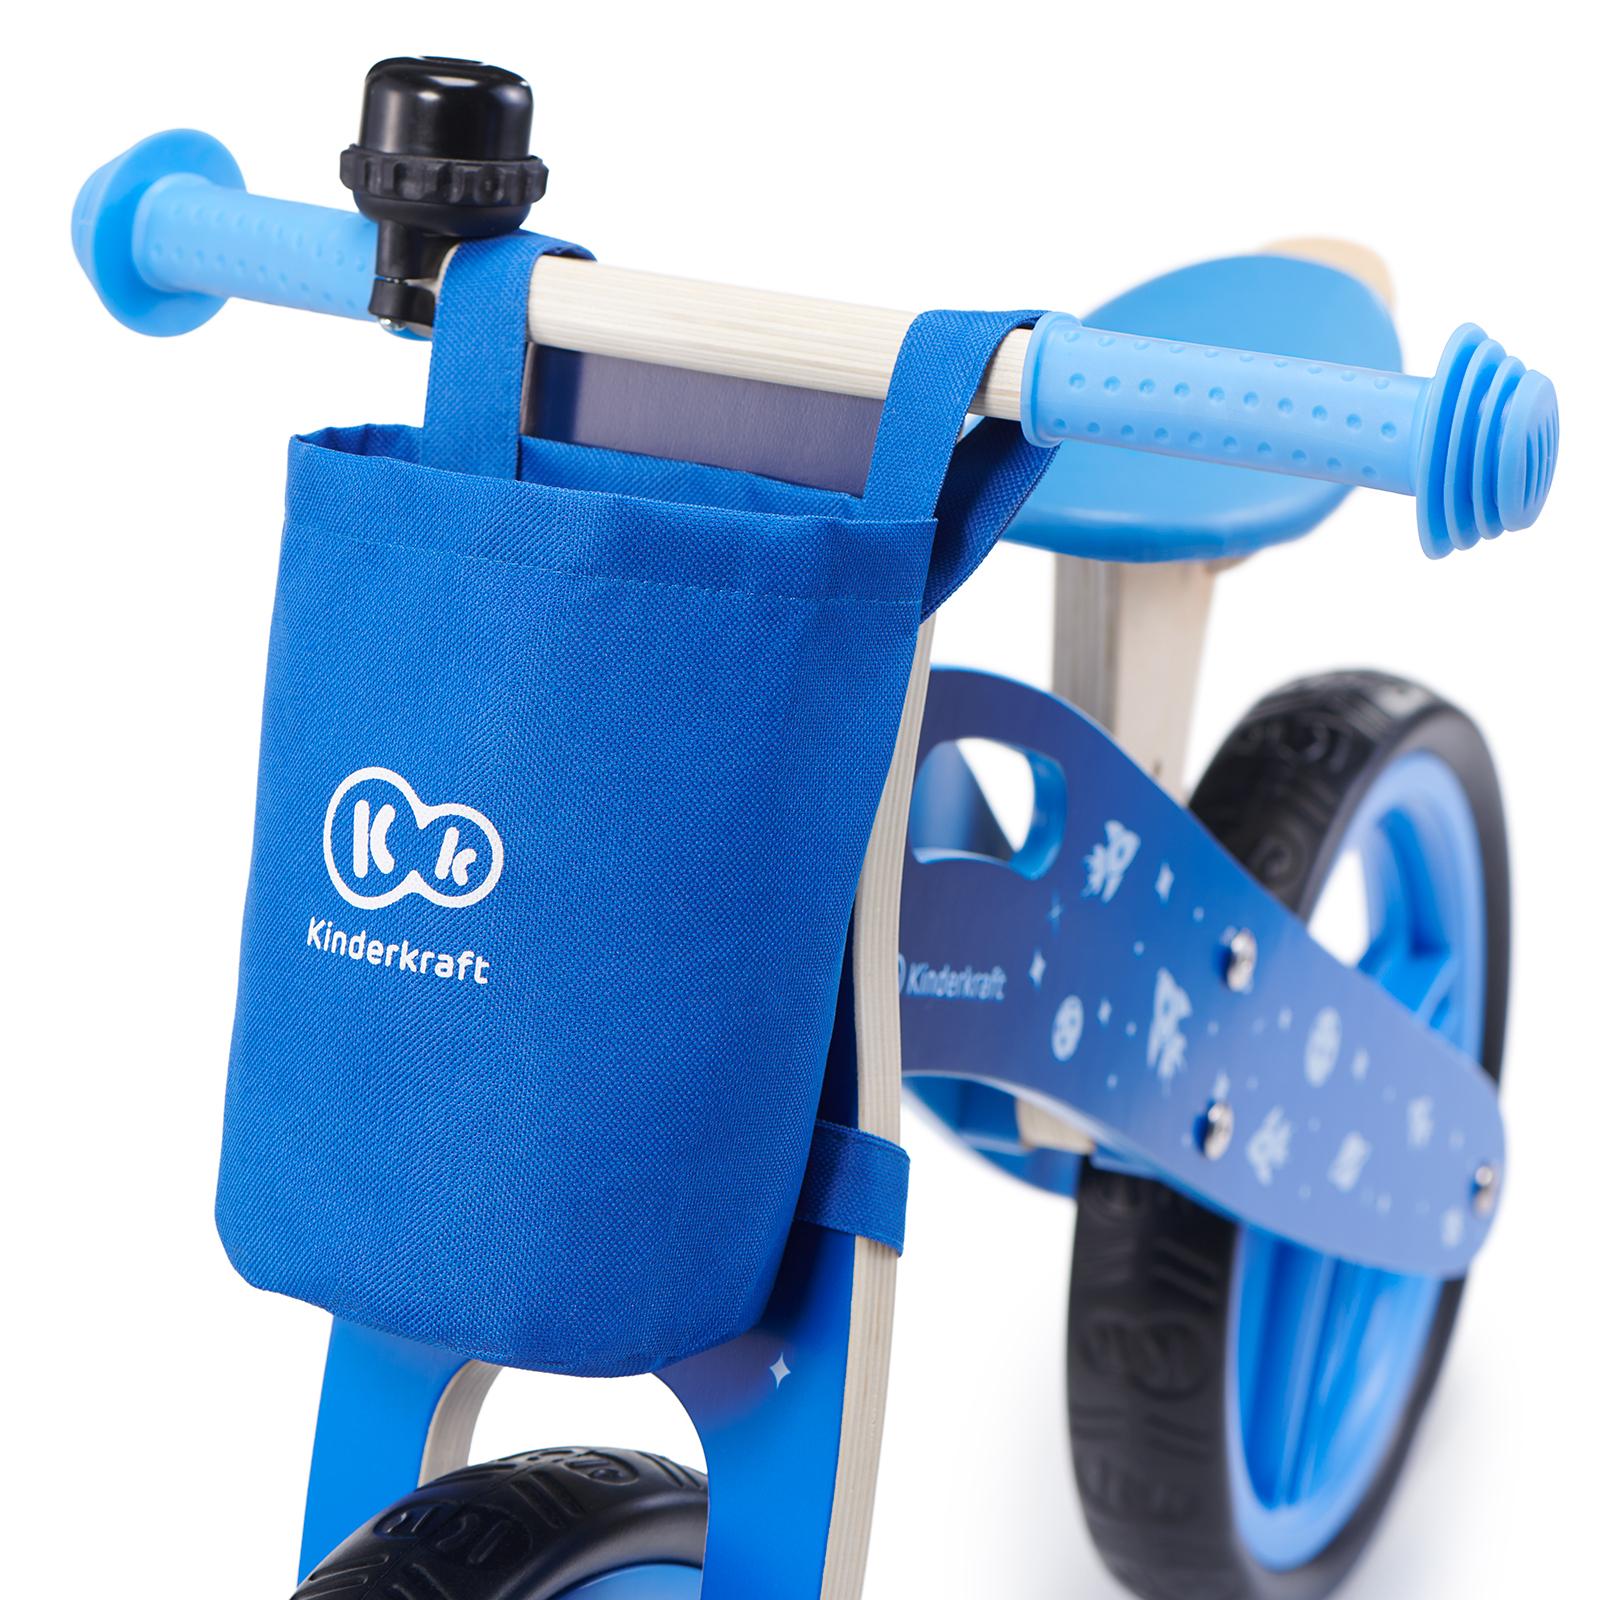 Balans bicikl guralica Kinderkraft GALAXY blue bicikl bez pedala, torbica i zvonce